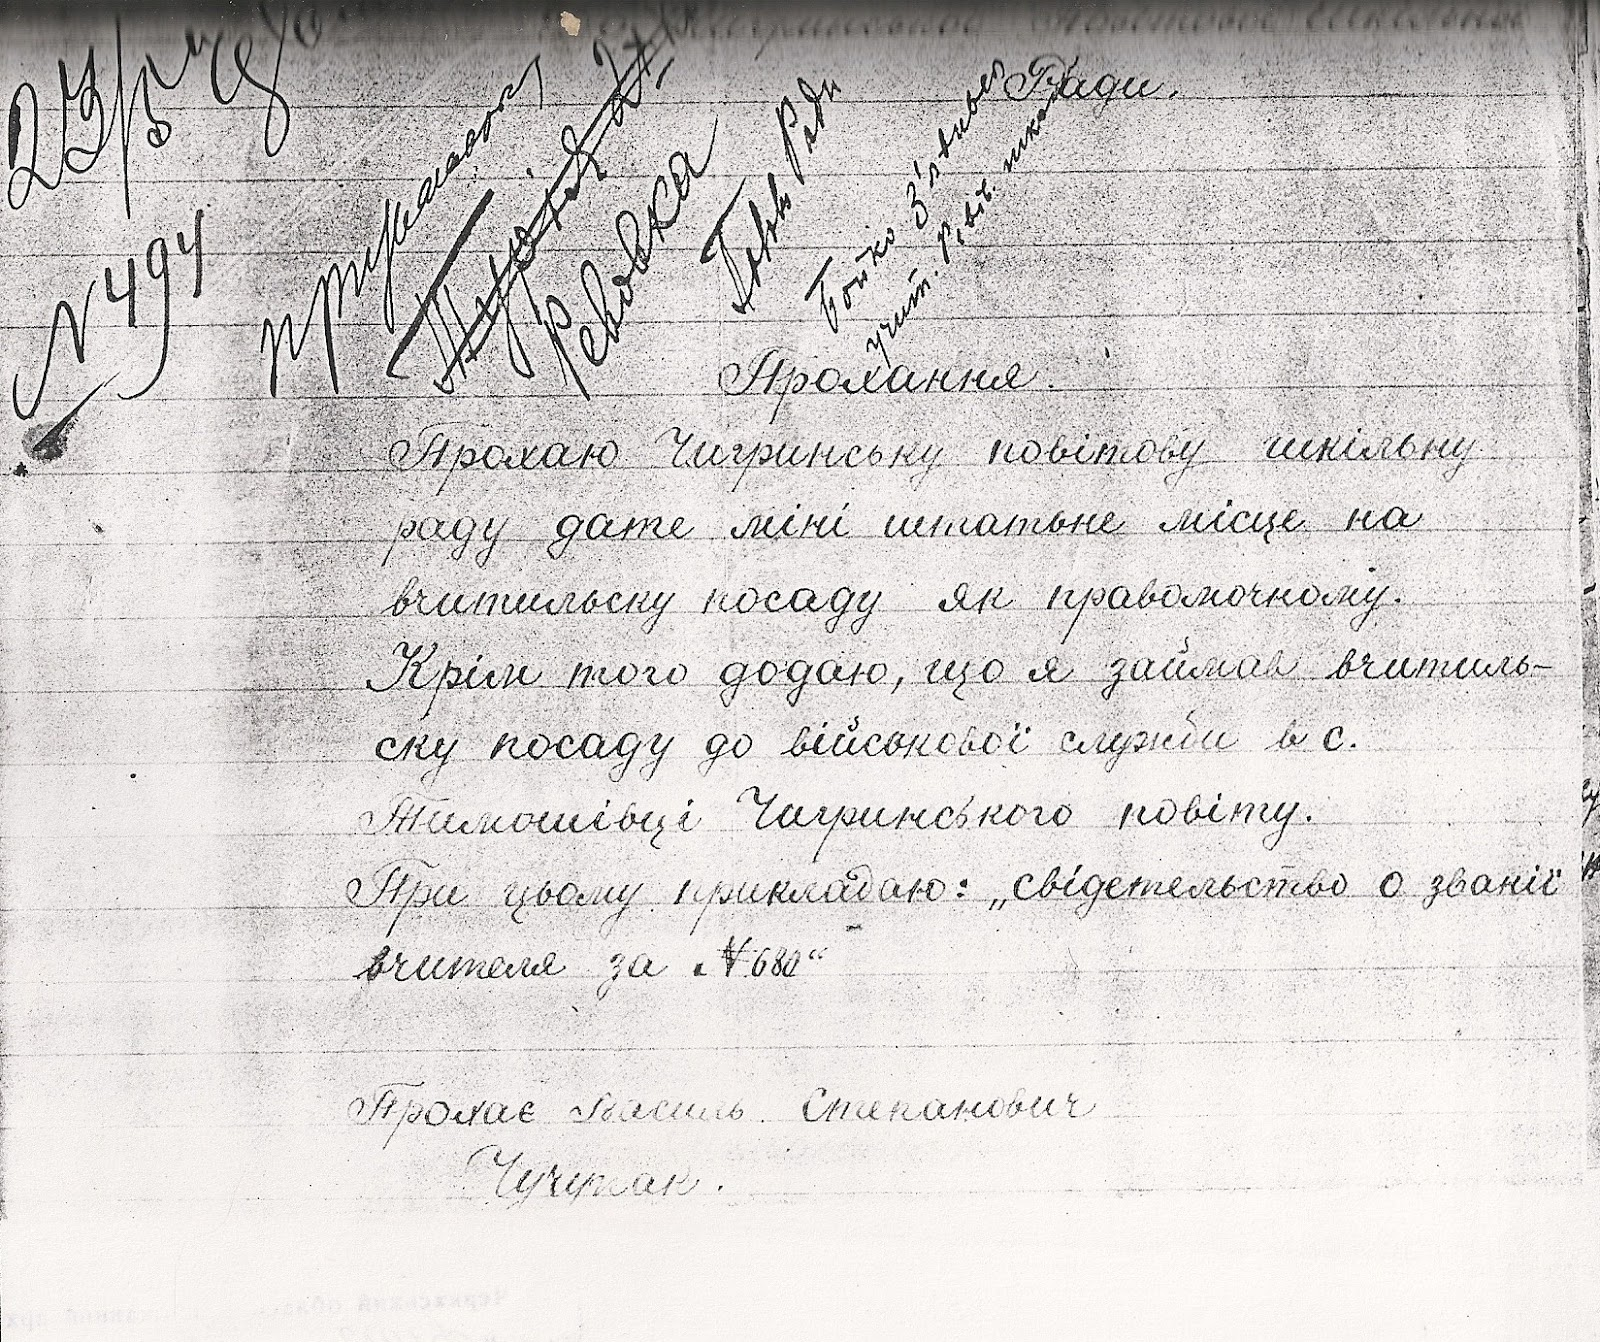 Заява Василя Чучупака про прийняття на посаду вчителя з приватної колекції Олександра Солодара